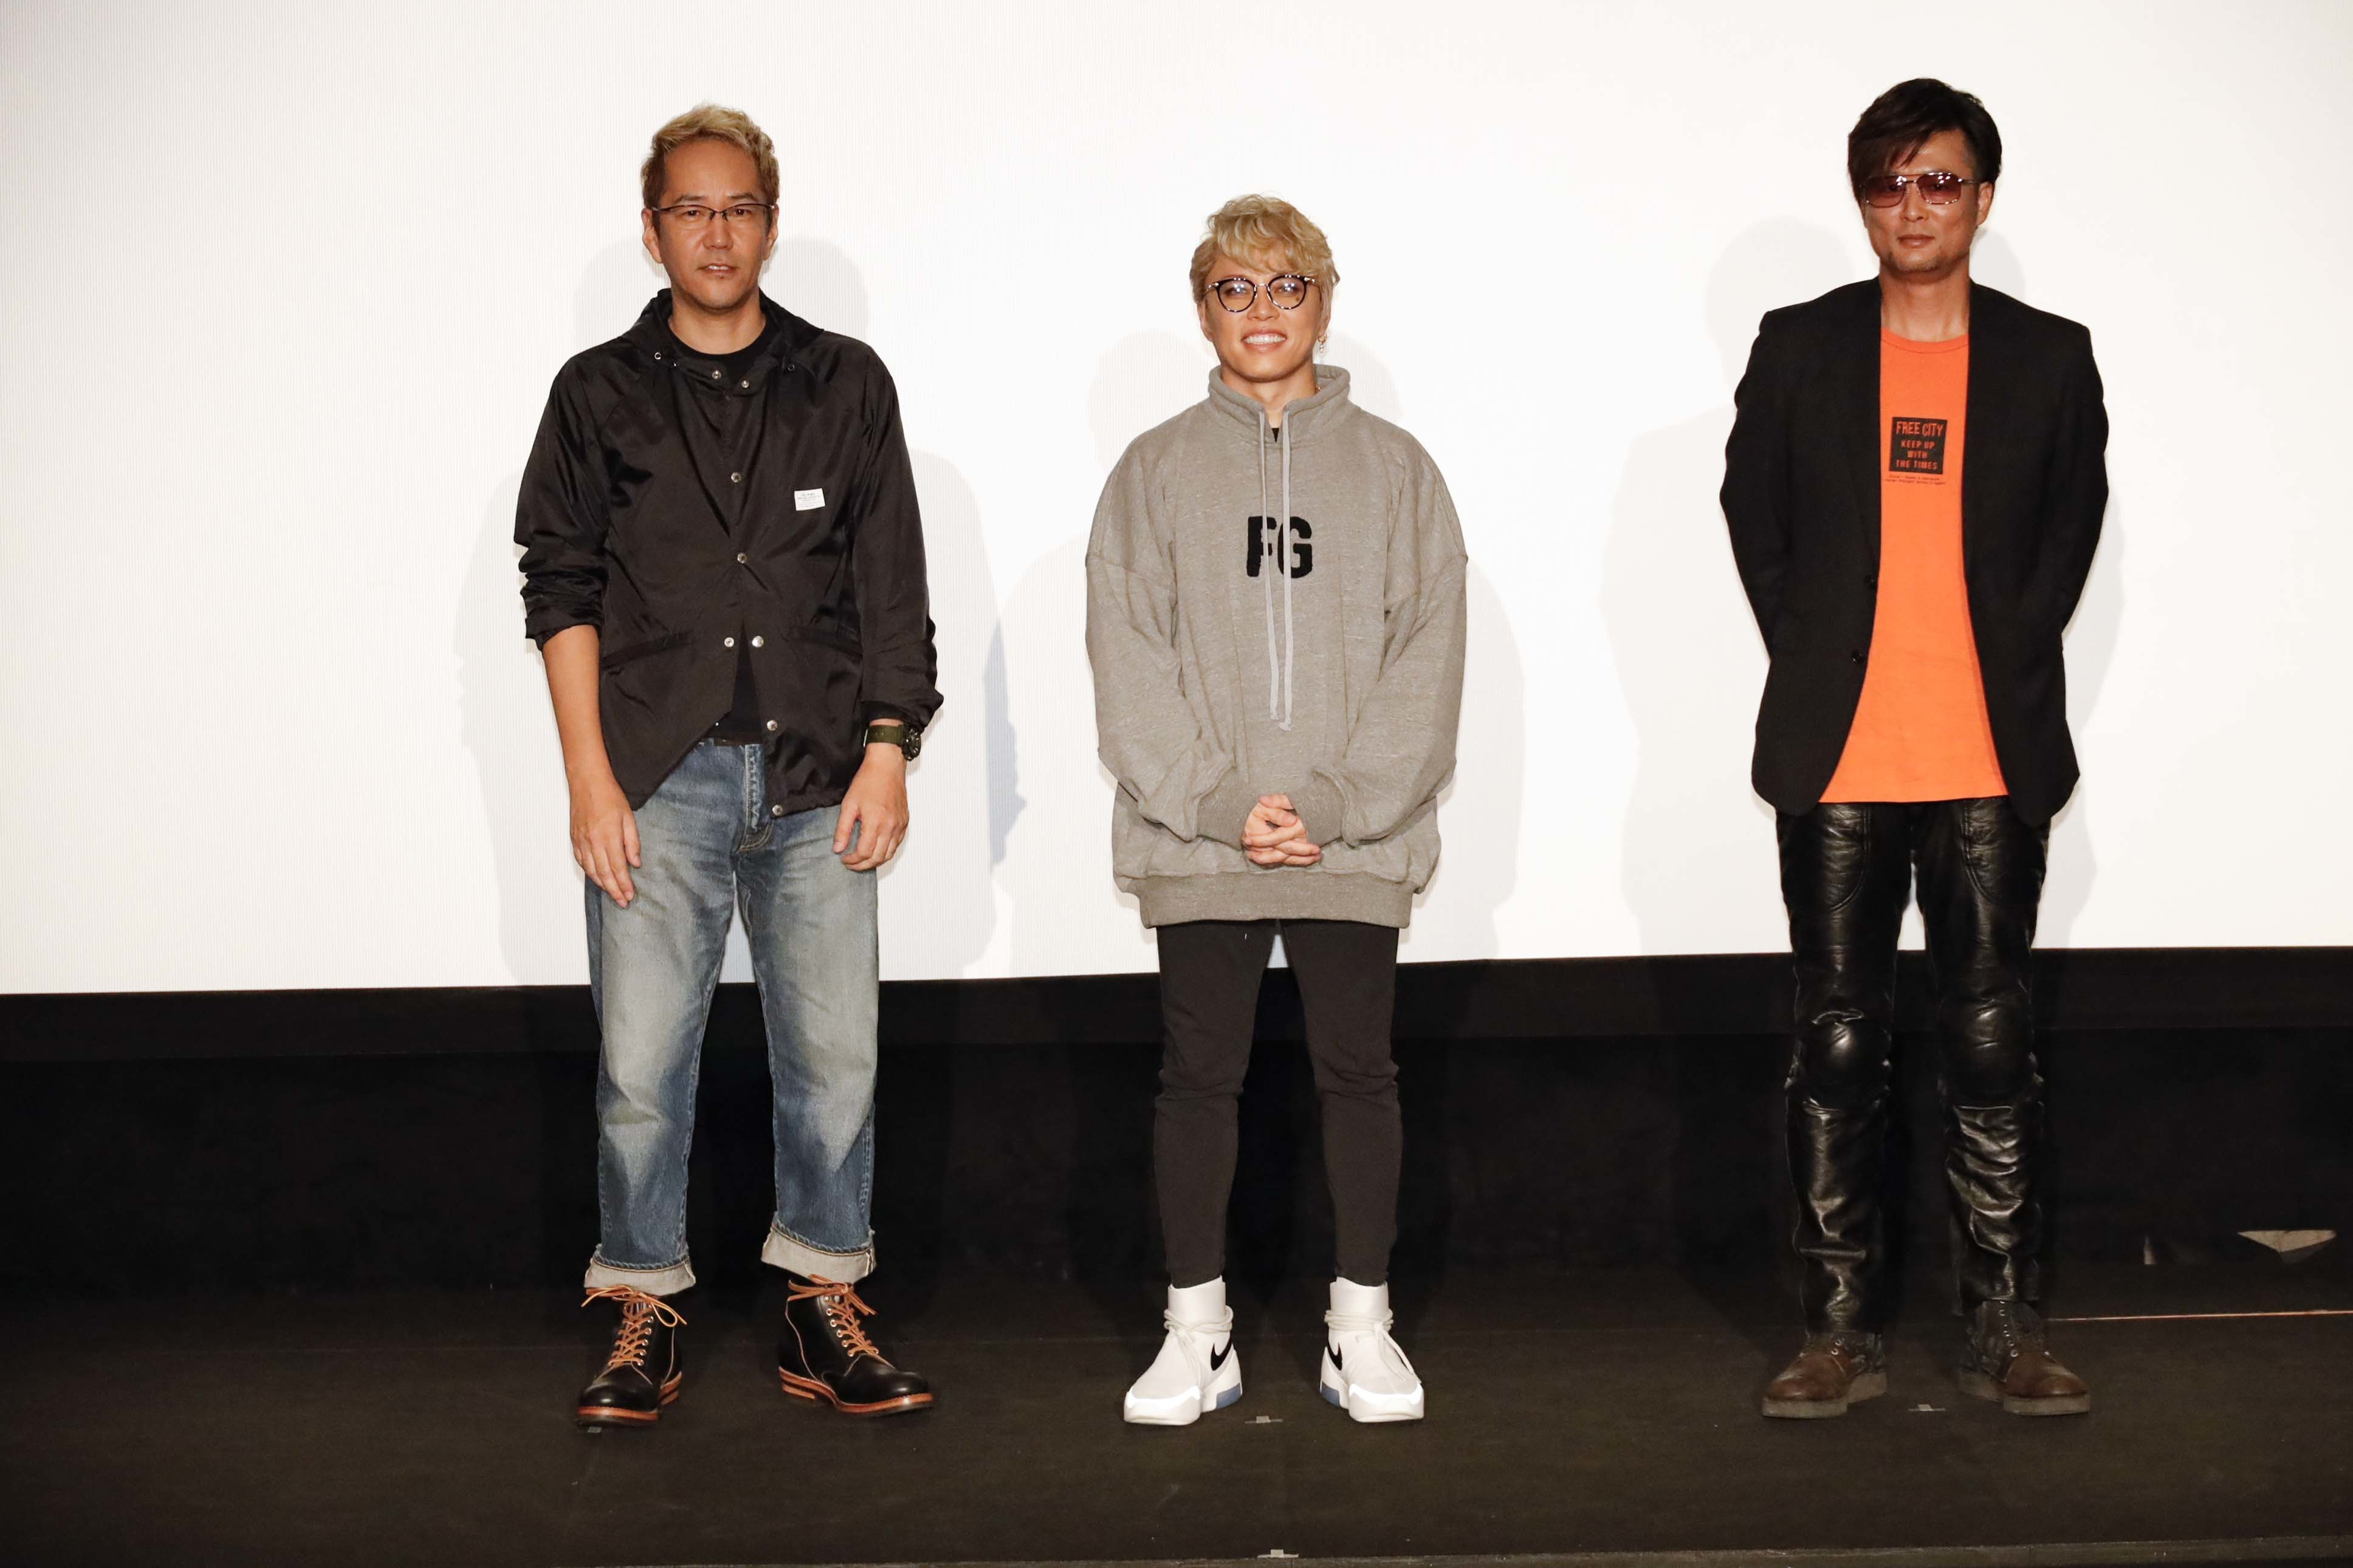 左から、神山健治監督、西川貴教、A.T.氏